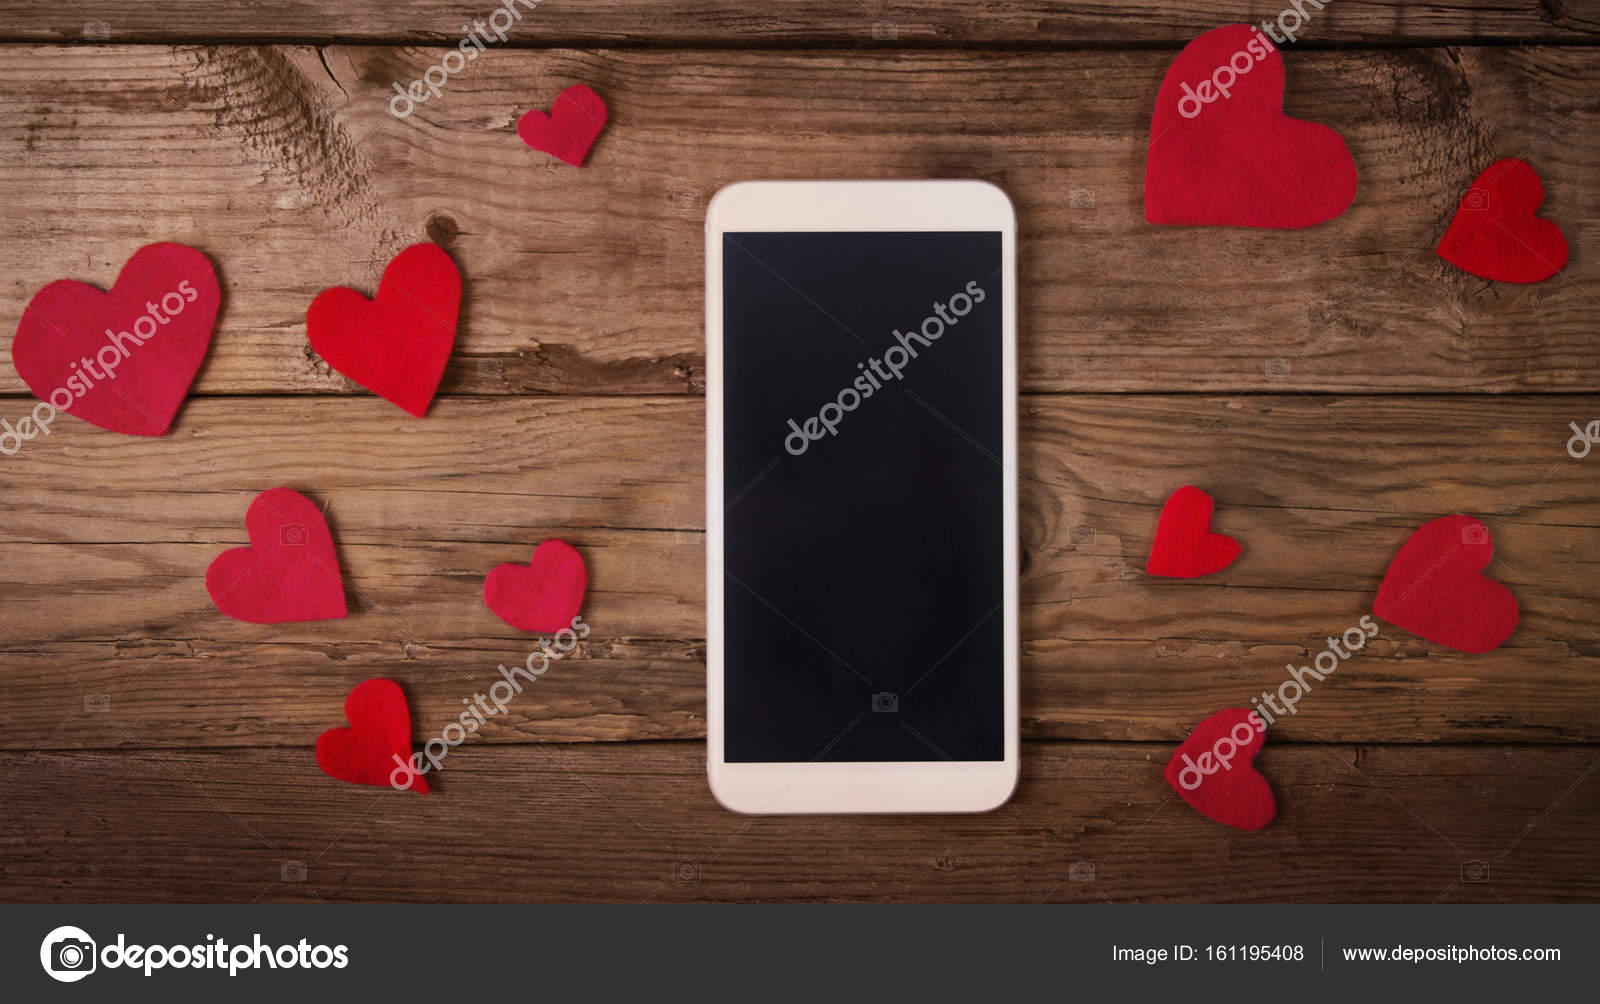 75 Romantic Mobile Wallpaper HD